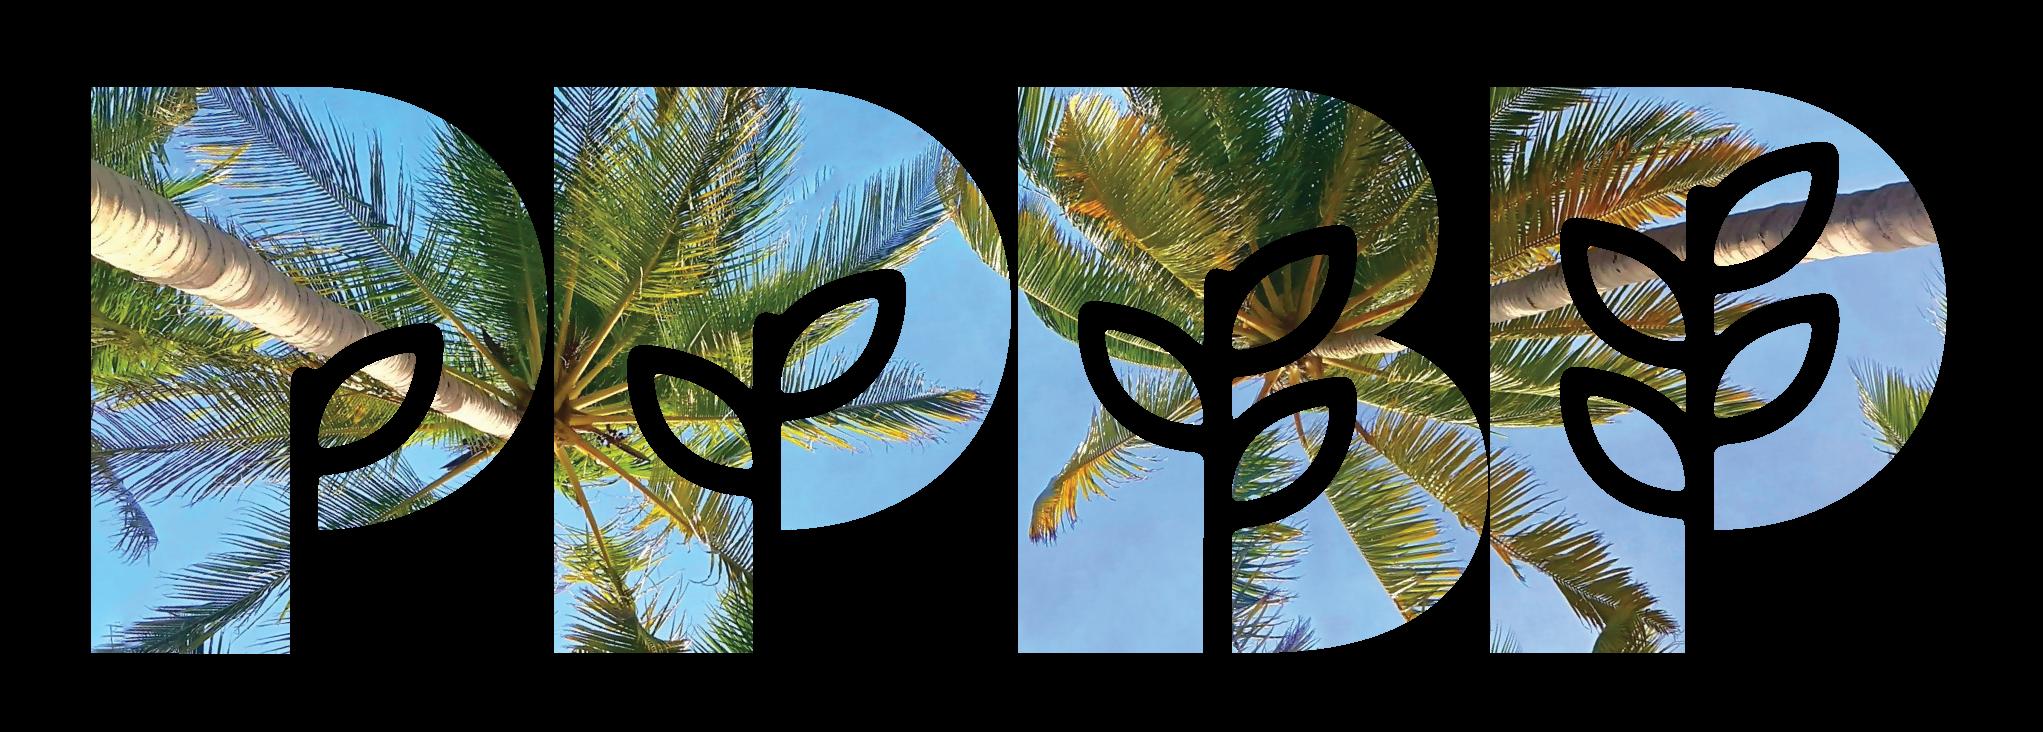 190515_PPBP-logo3_PD.png